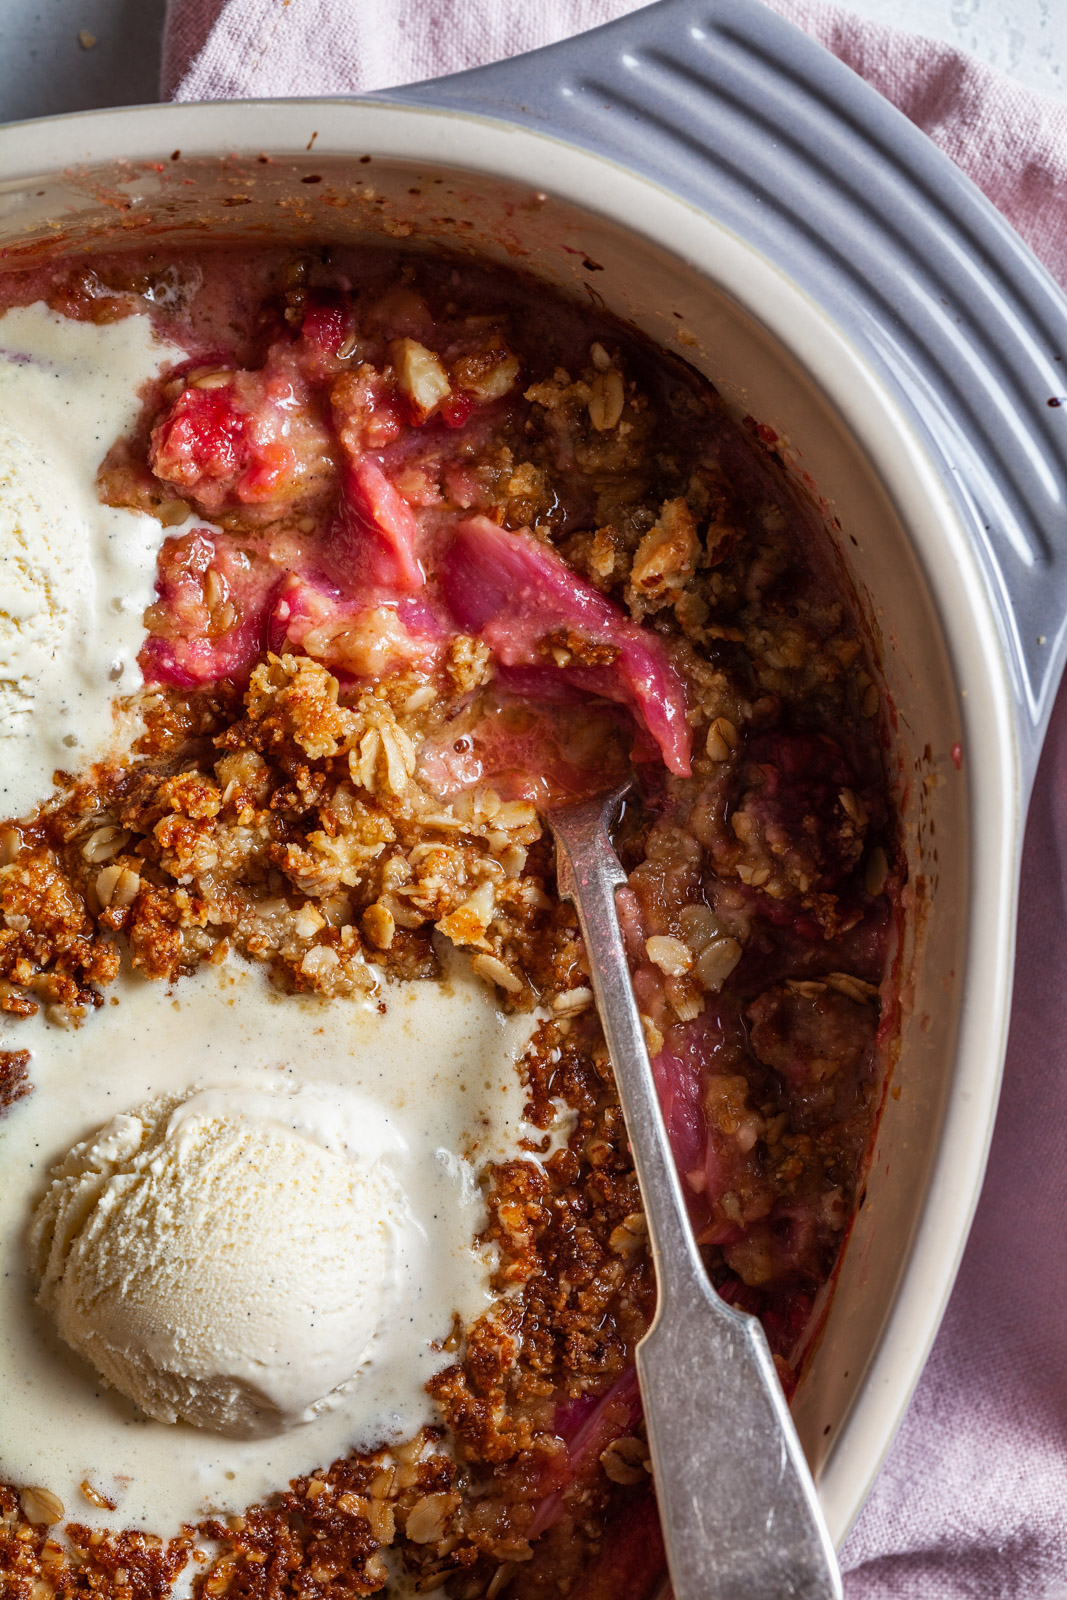 Warm Vanilla Rhubarb Crisp